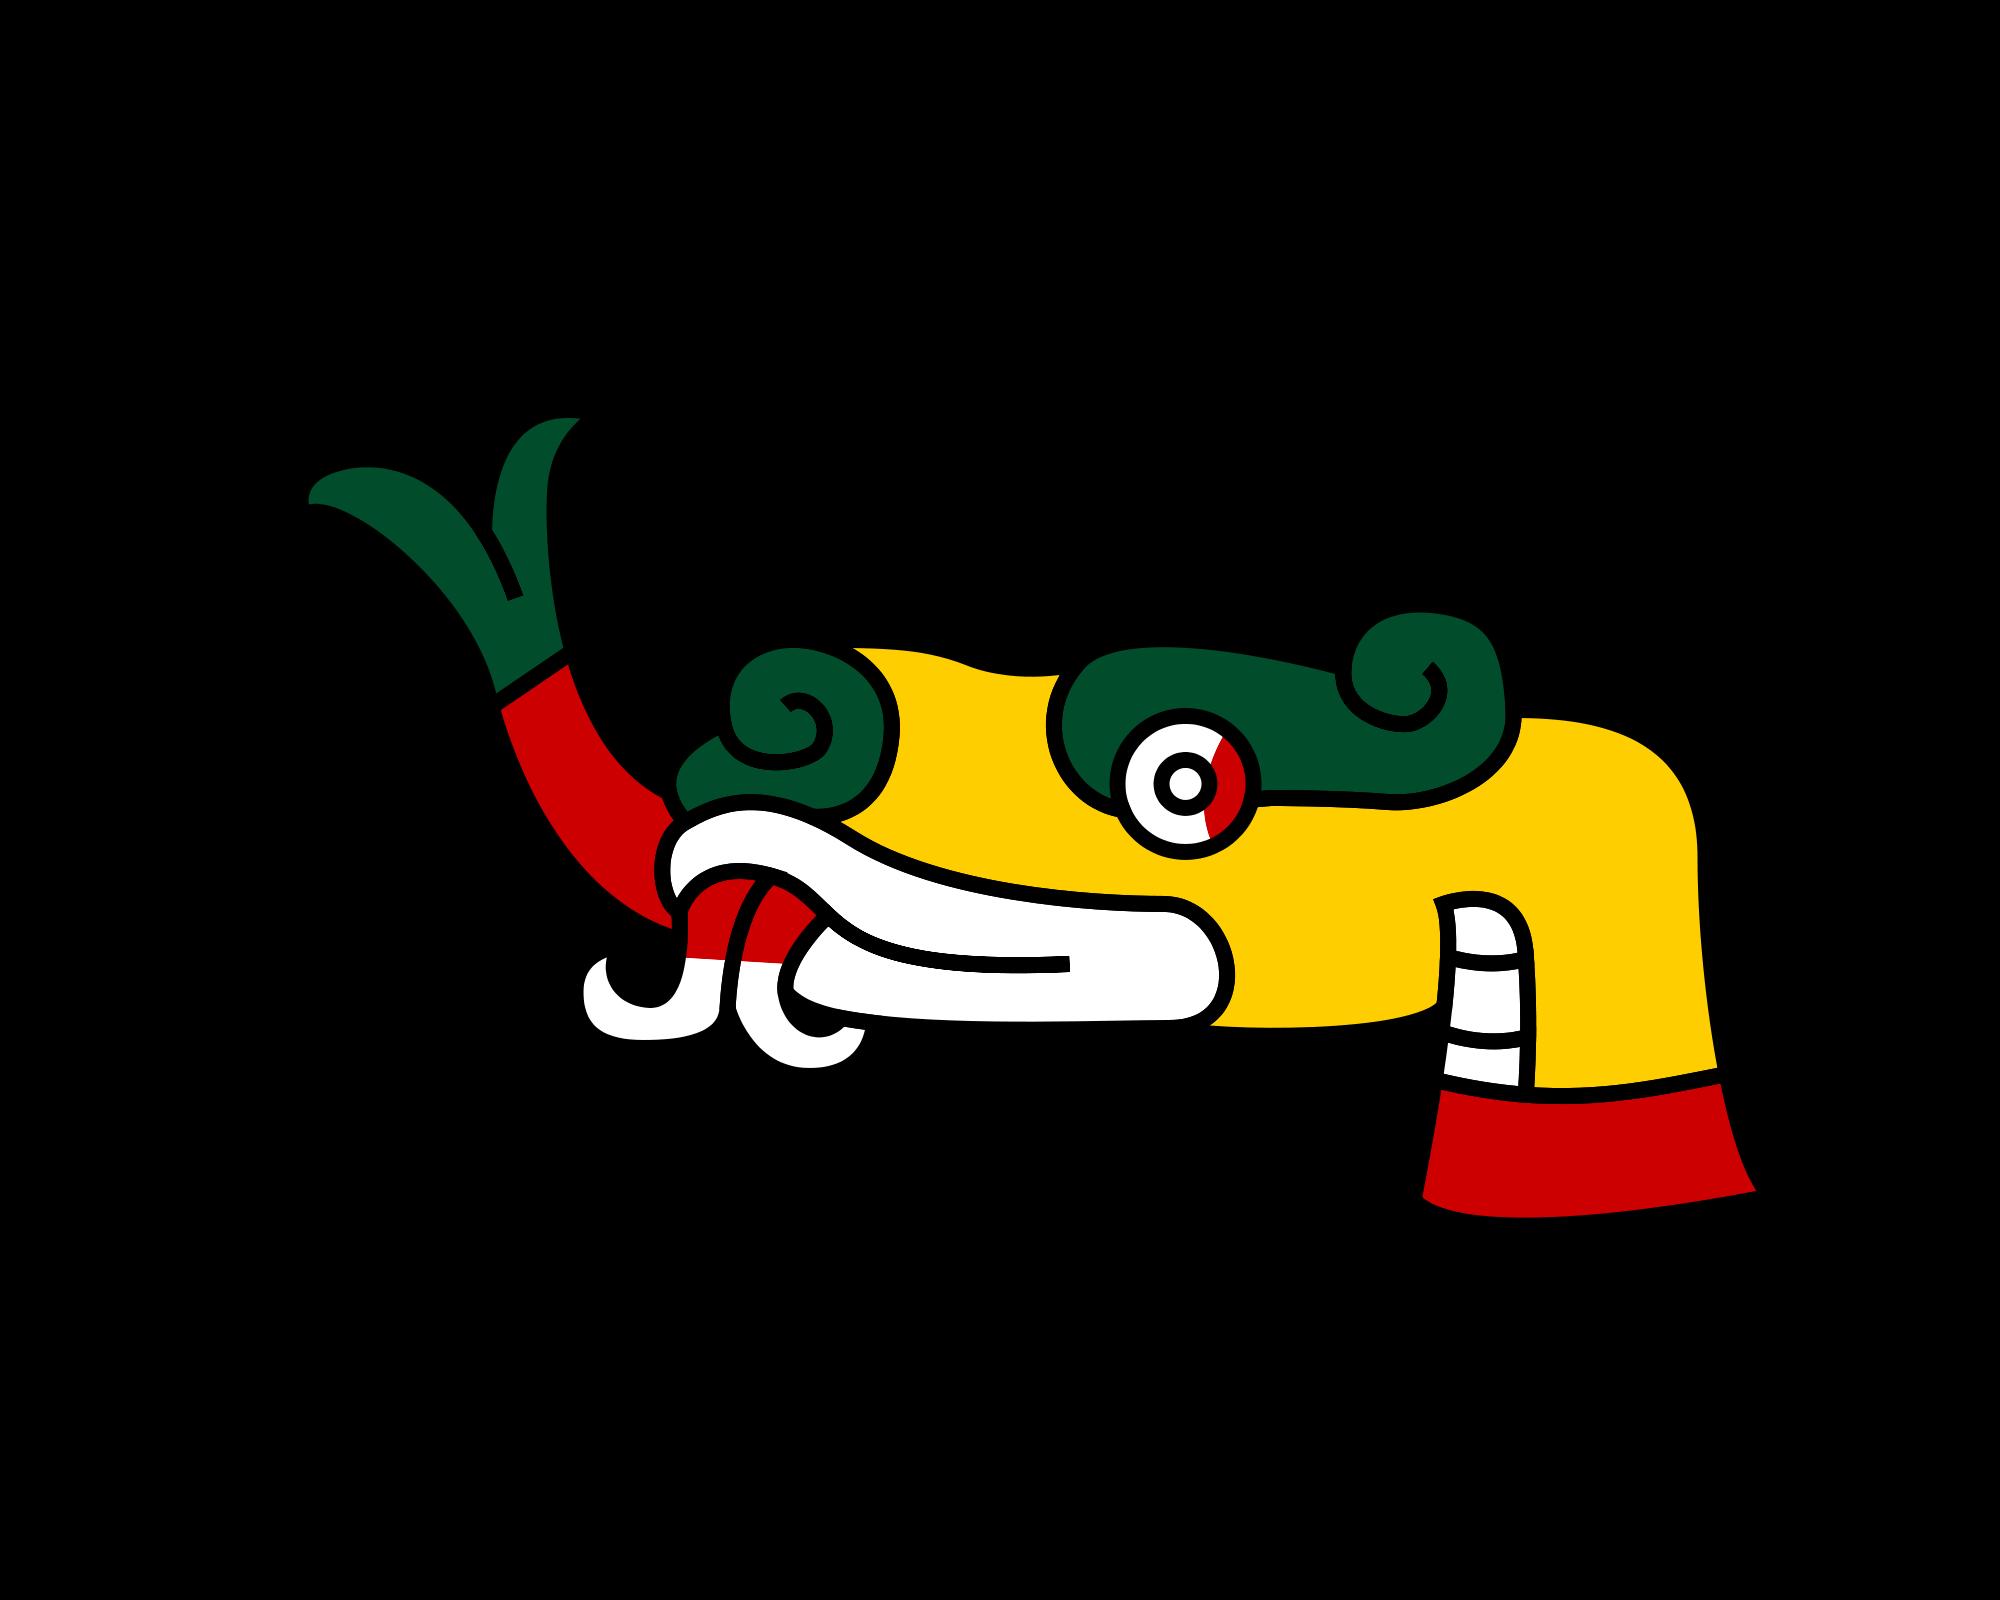 coatl-aztec-zodiac-underluckystars